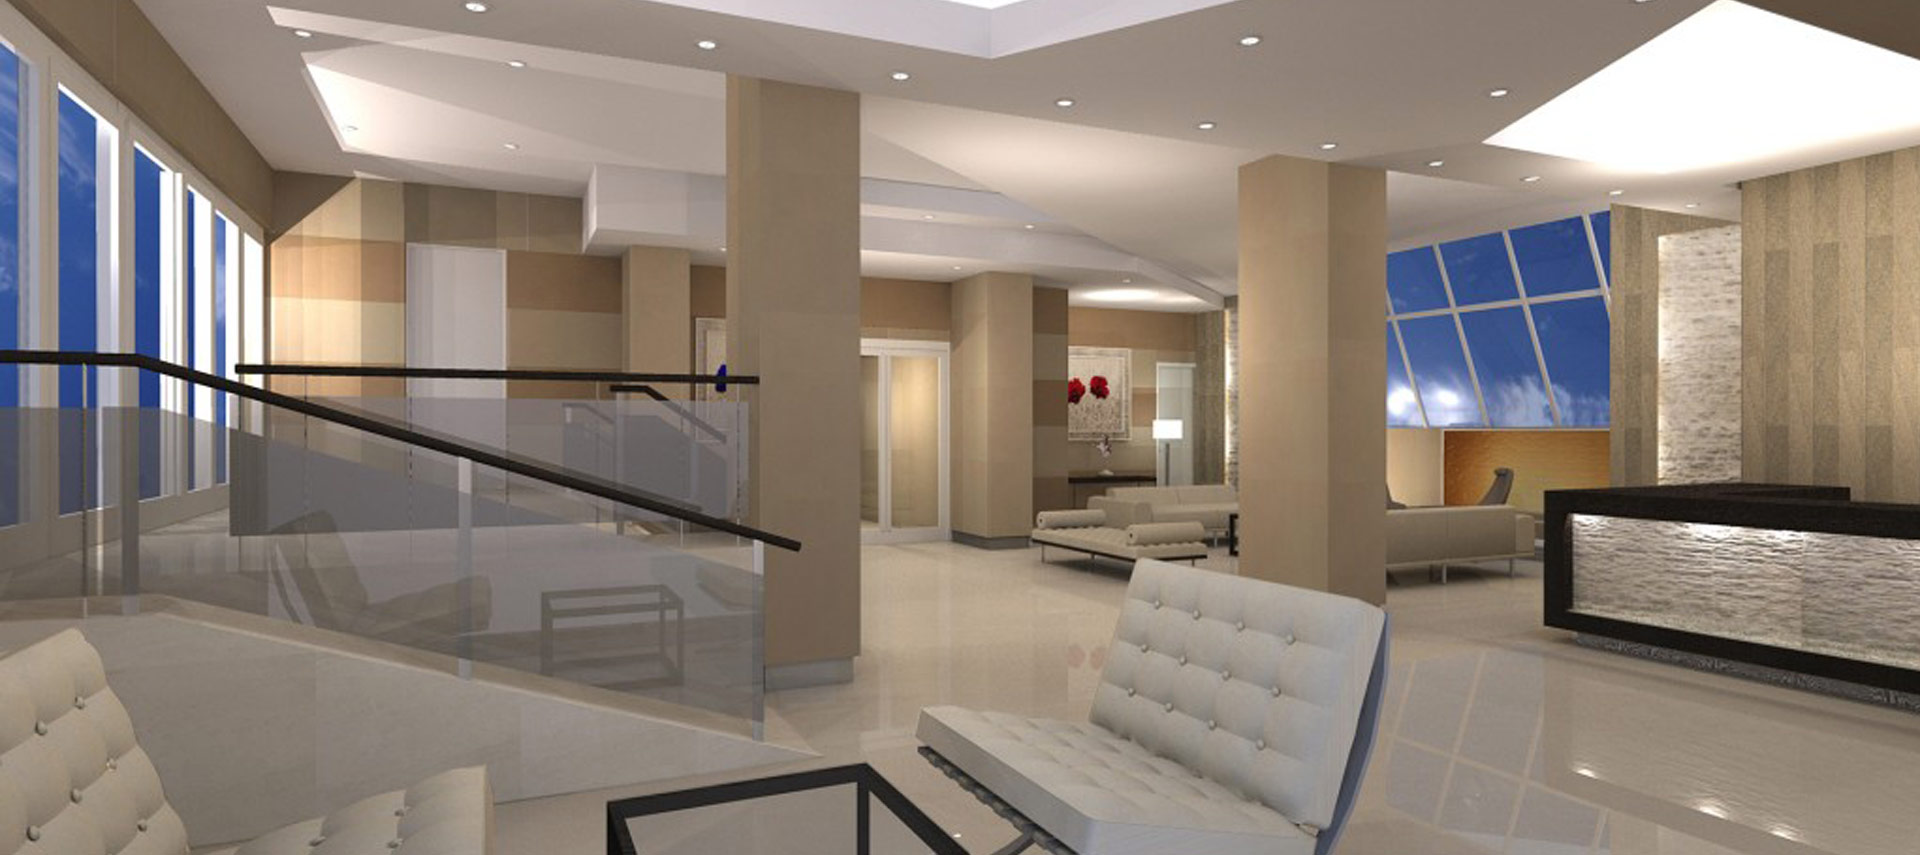 Belvedere Interior Design / Interior Fit Out